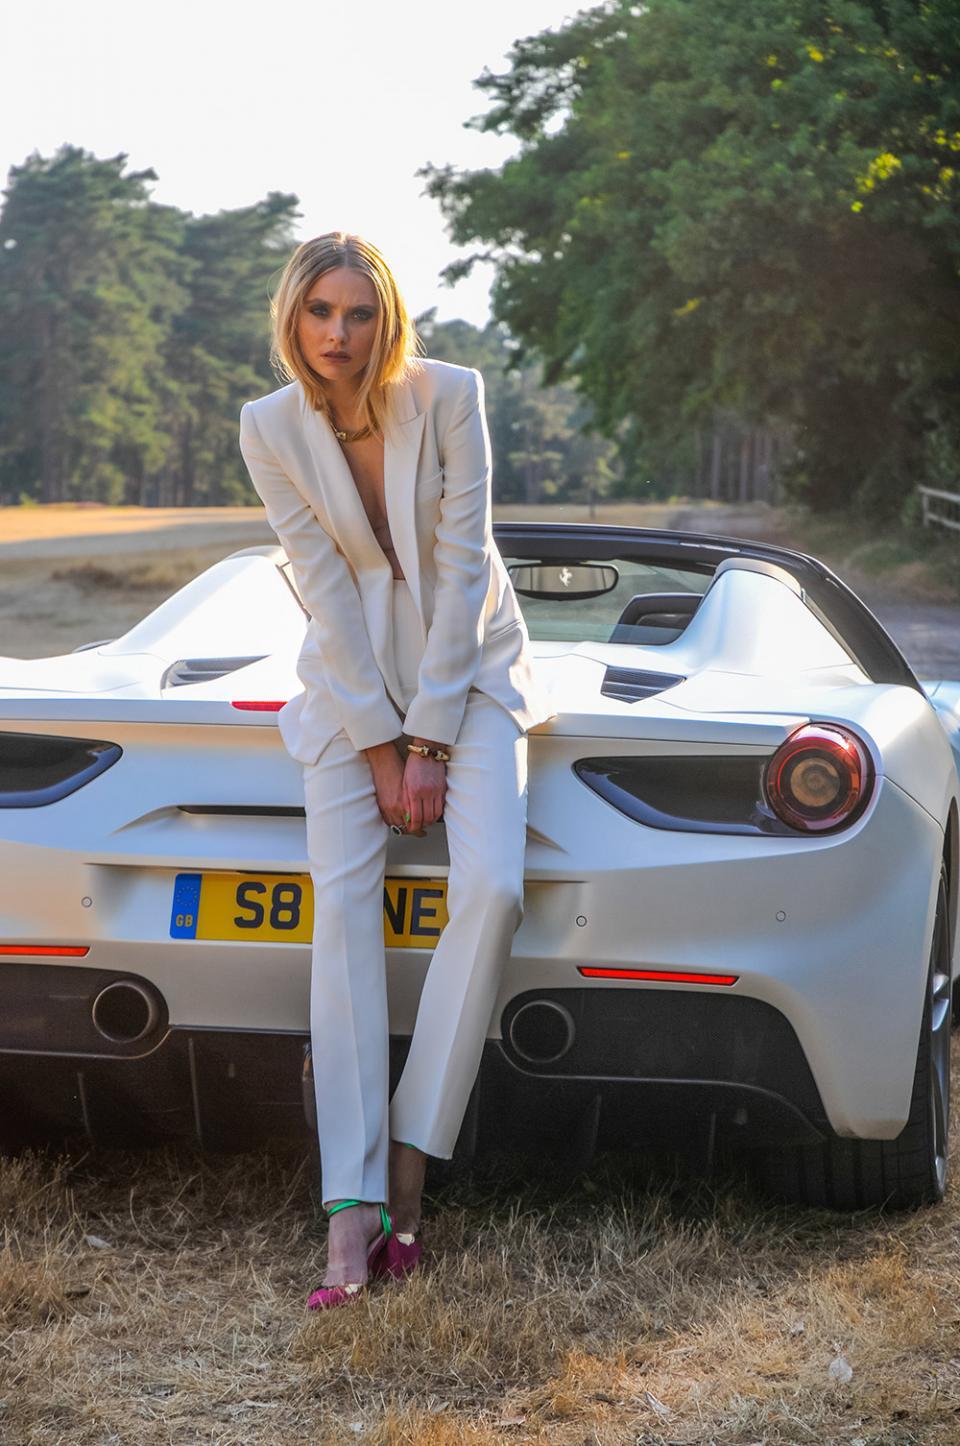 Ferrari 488 Supercar Fashion Women's Fashion White Suit